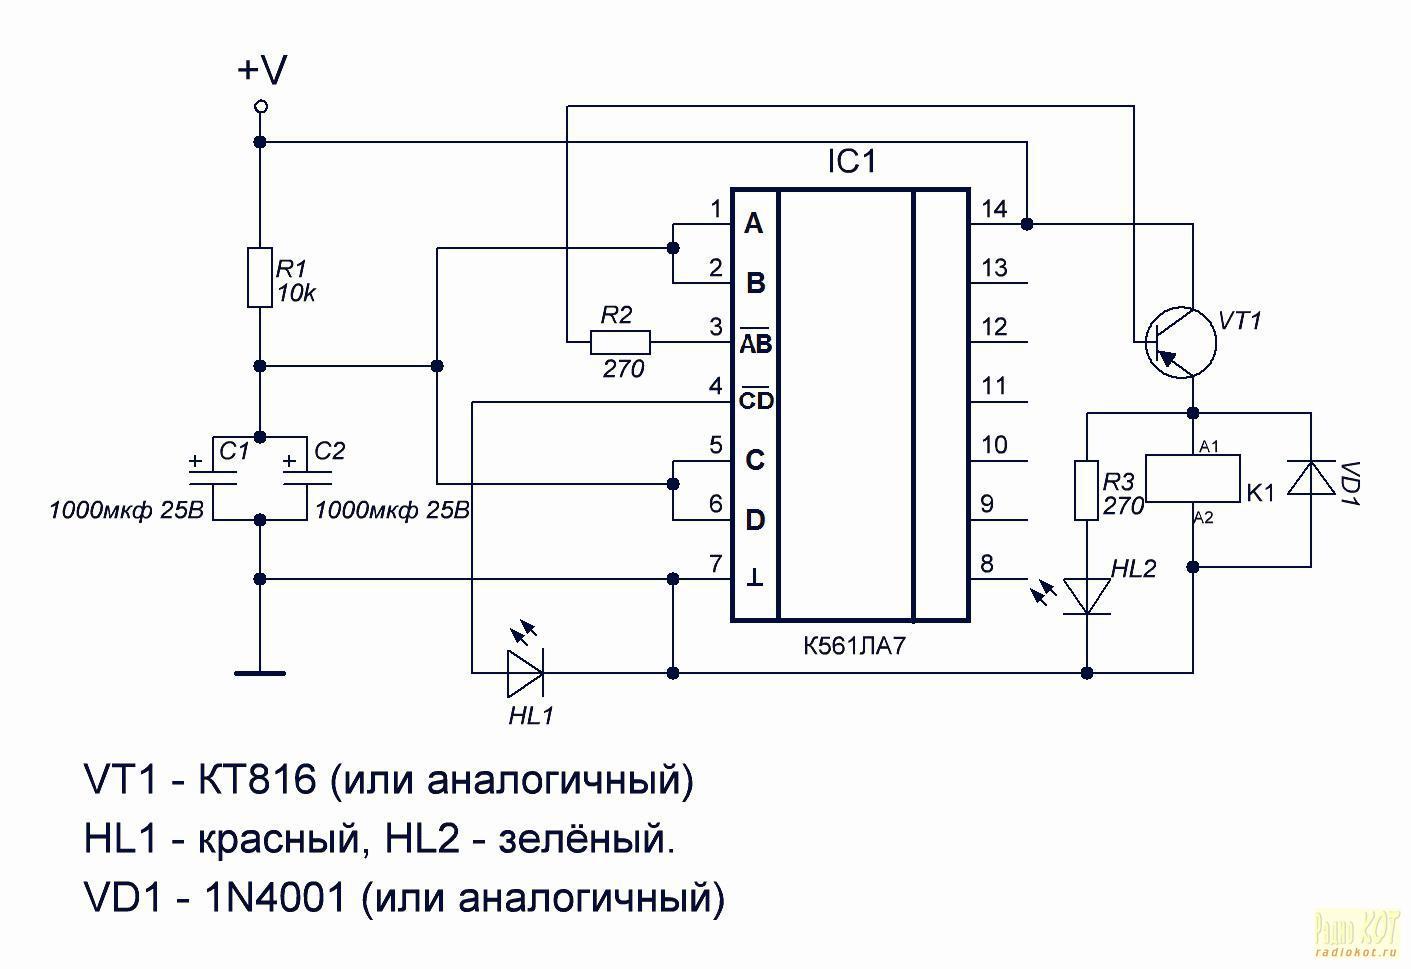 схема включения транзистора автоматика дома